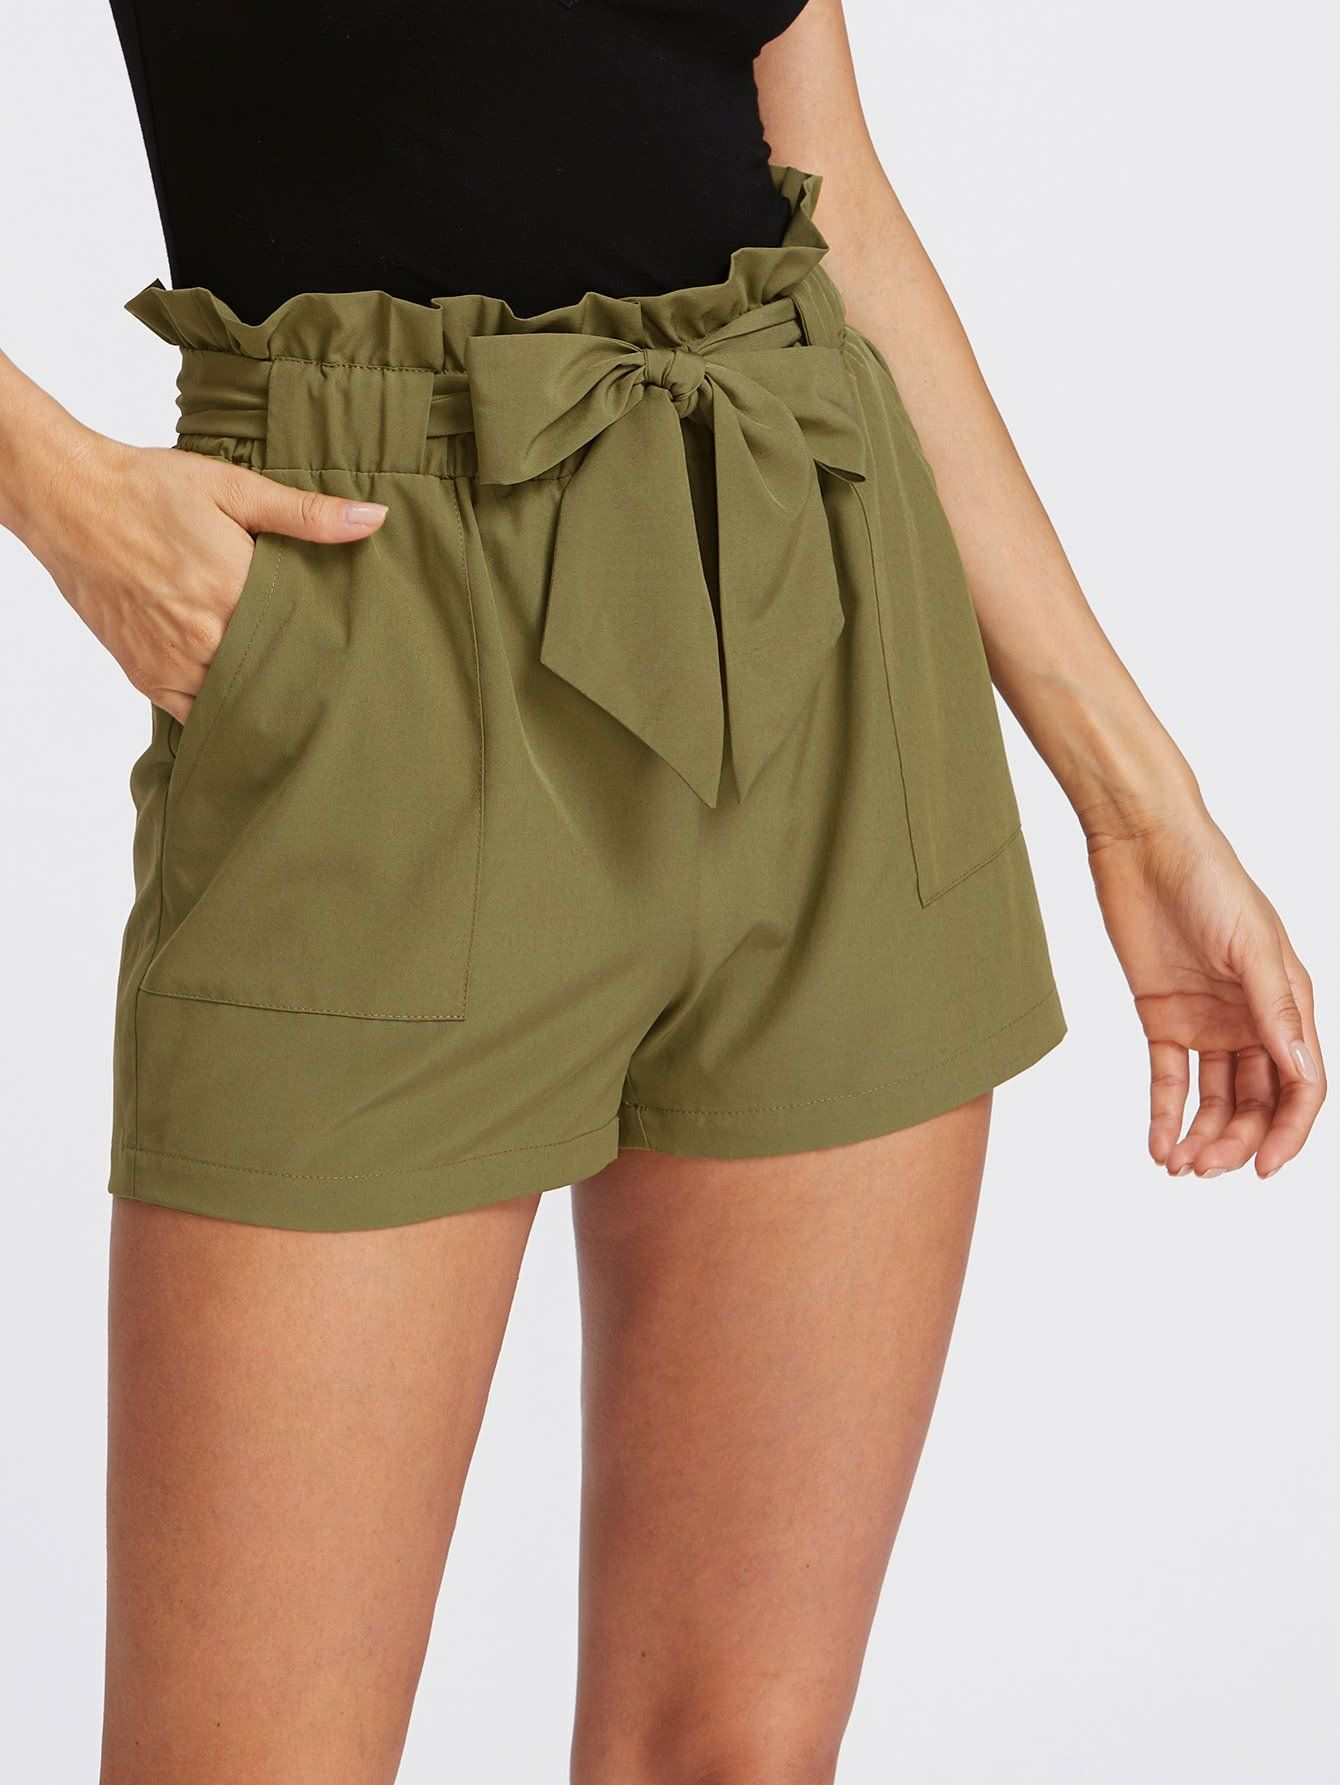 7140edc4eb Self Tie Ruffle Waist Shorts Army Green in 2019 | Girls clothes ...